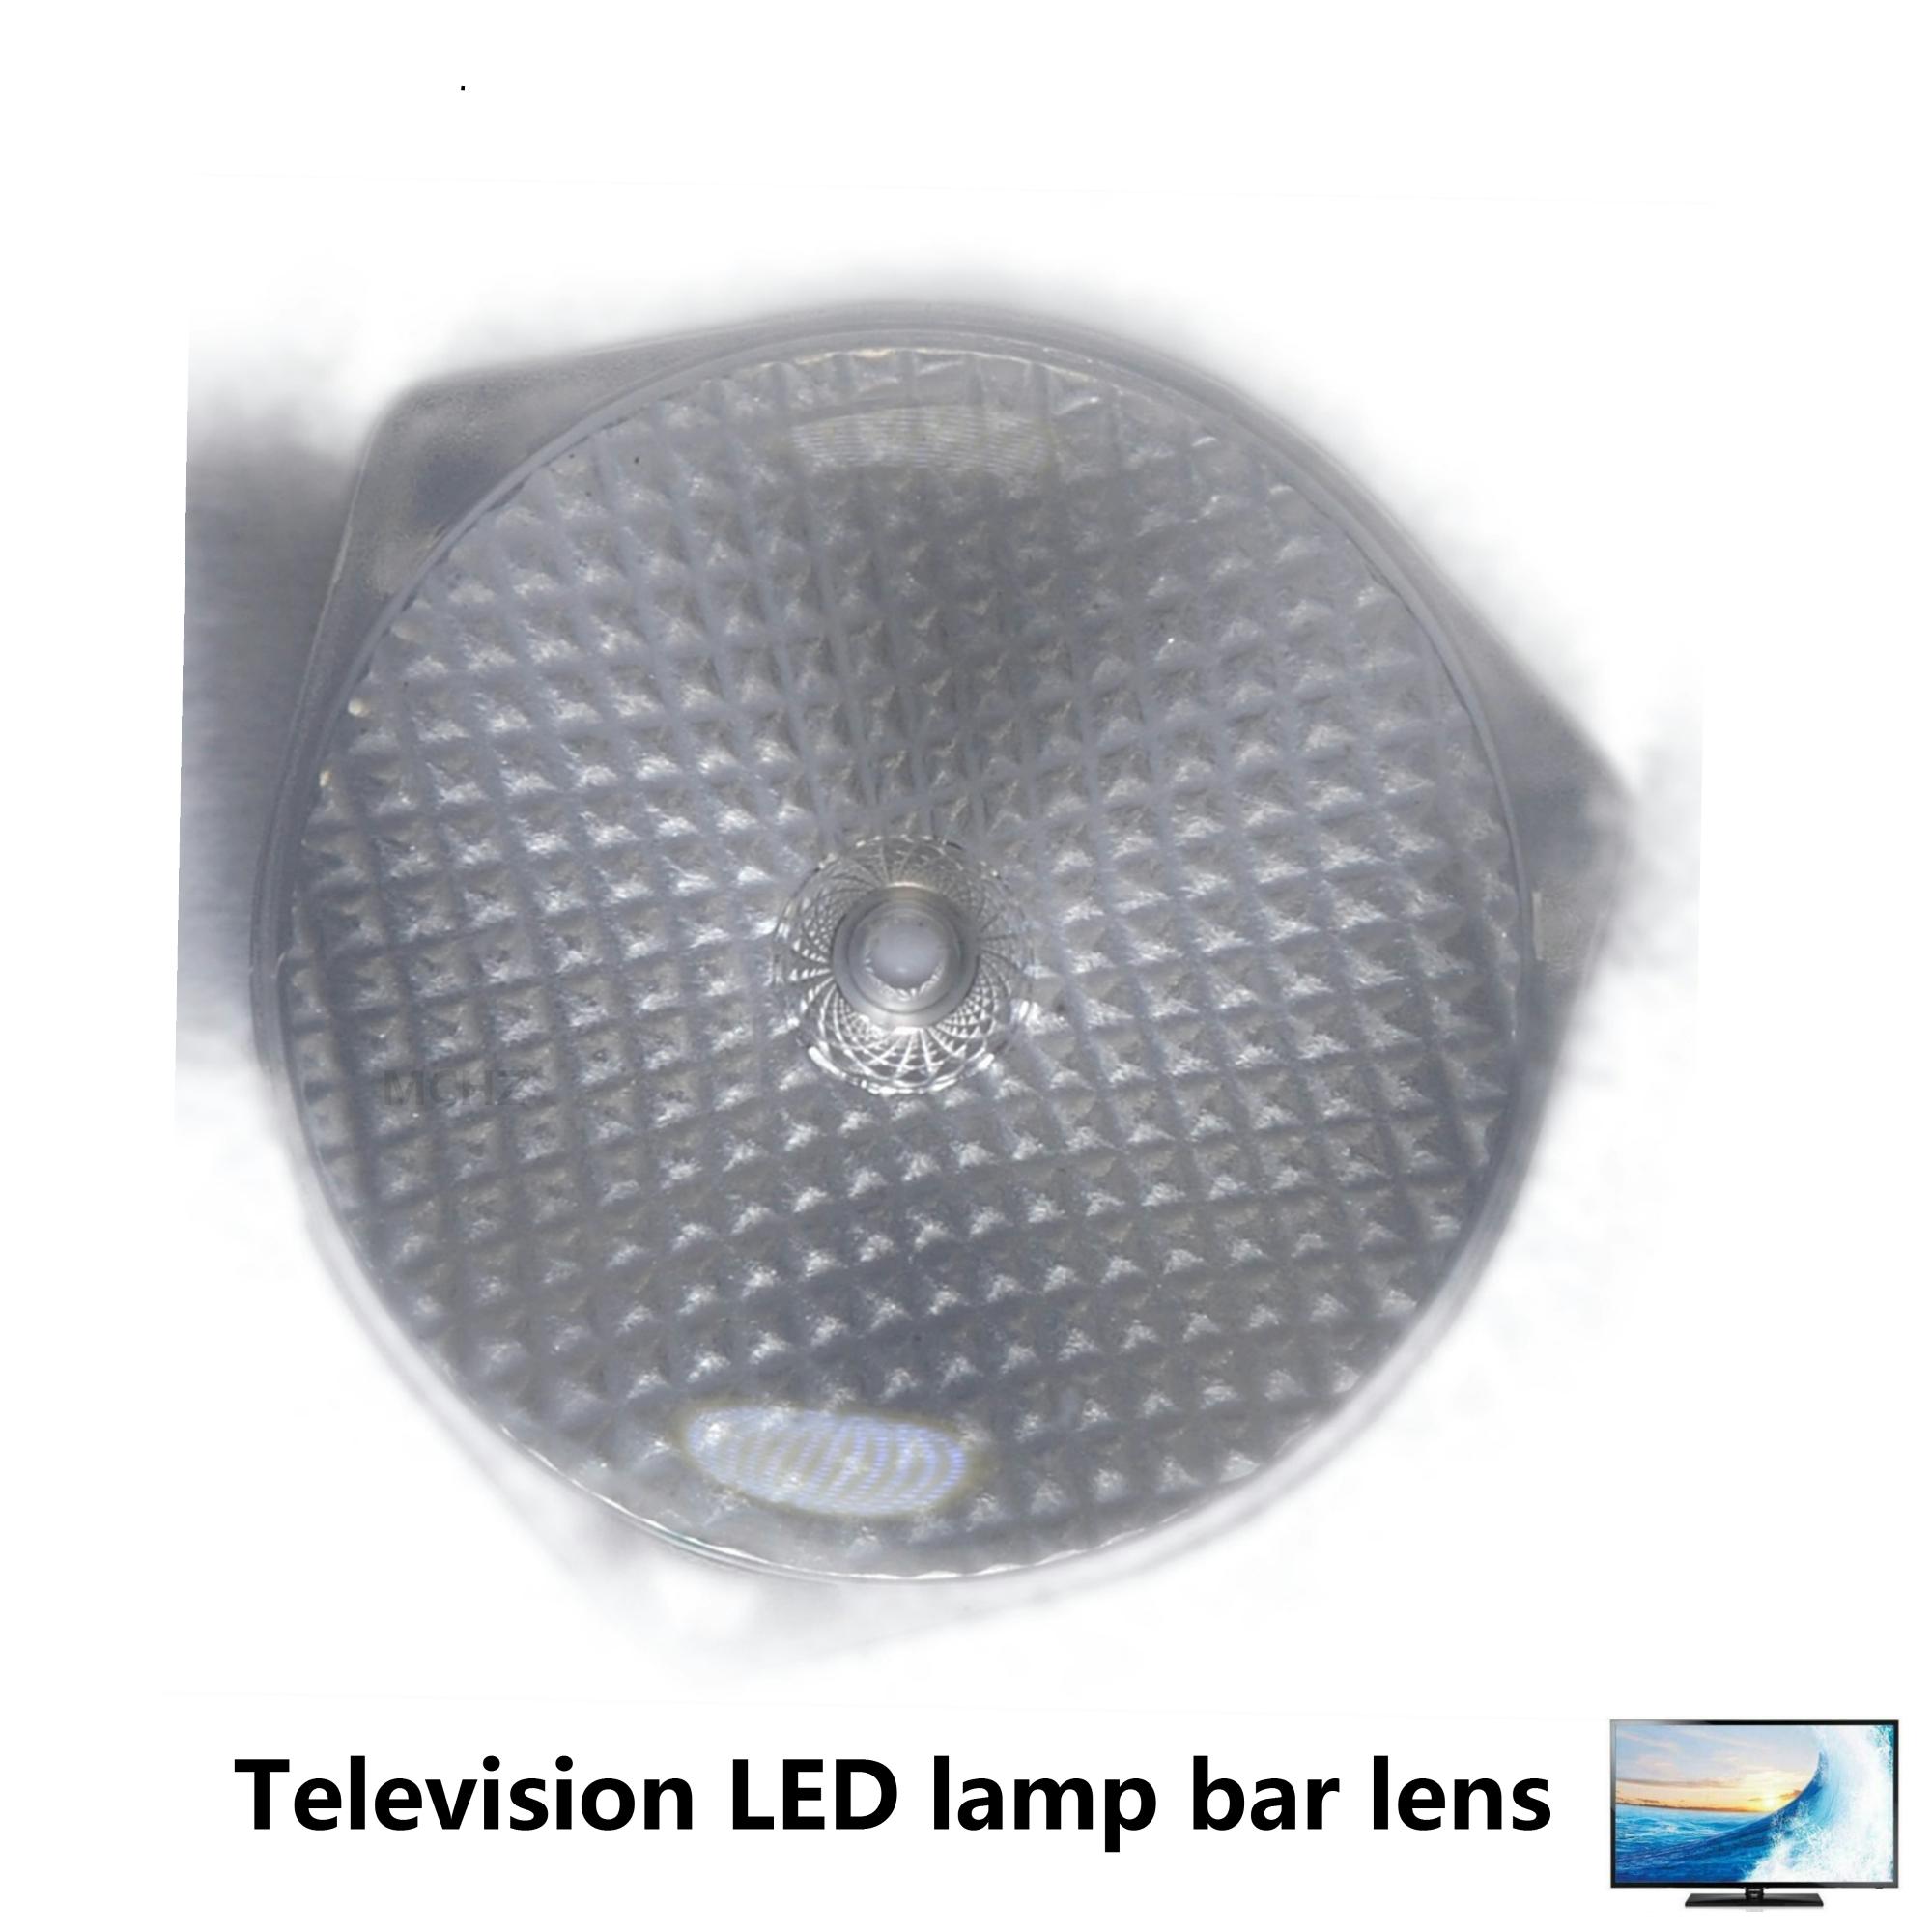 Lentes de 1000 piezas para productos para esos modelos Konka, Skyworth, Changhong, Hisense, TCL, TV LCD LED, lente de cuentas 2835, 3528, 3030,